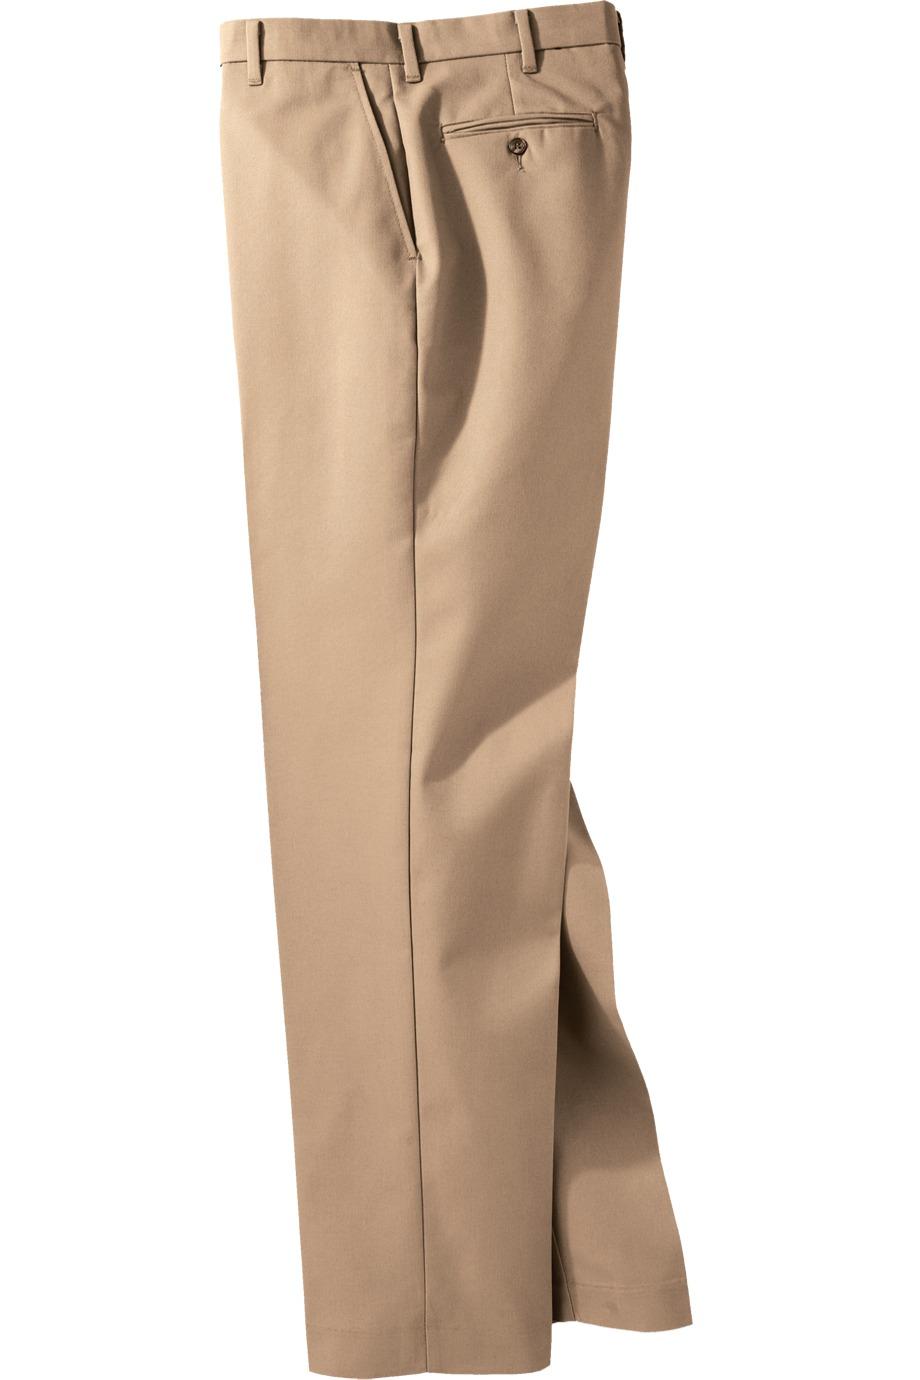 Edwards Garment 2510 - Men's Business Casual Flat Front Pant